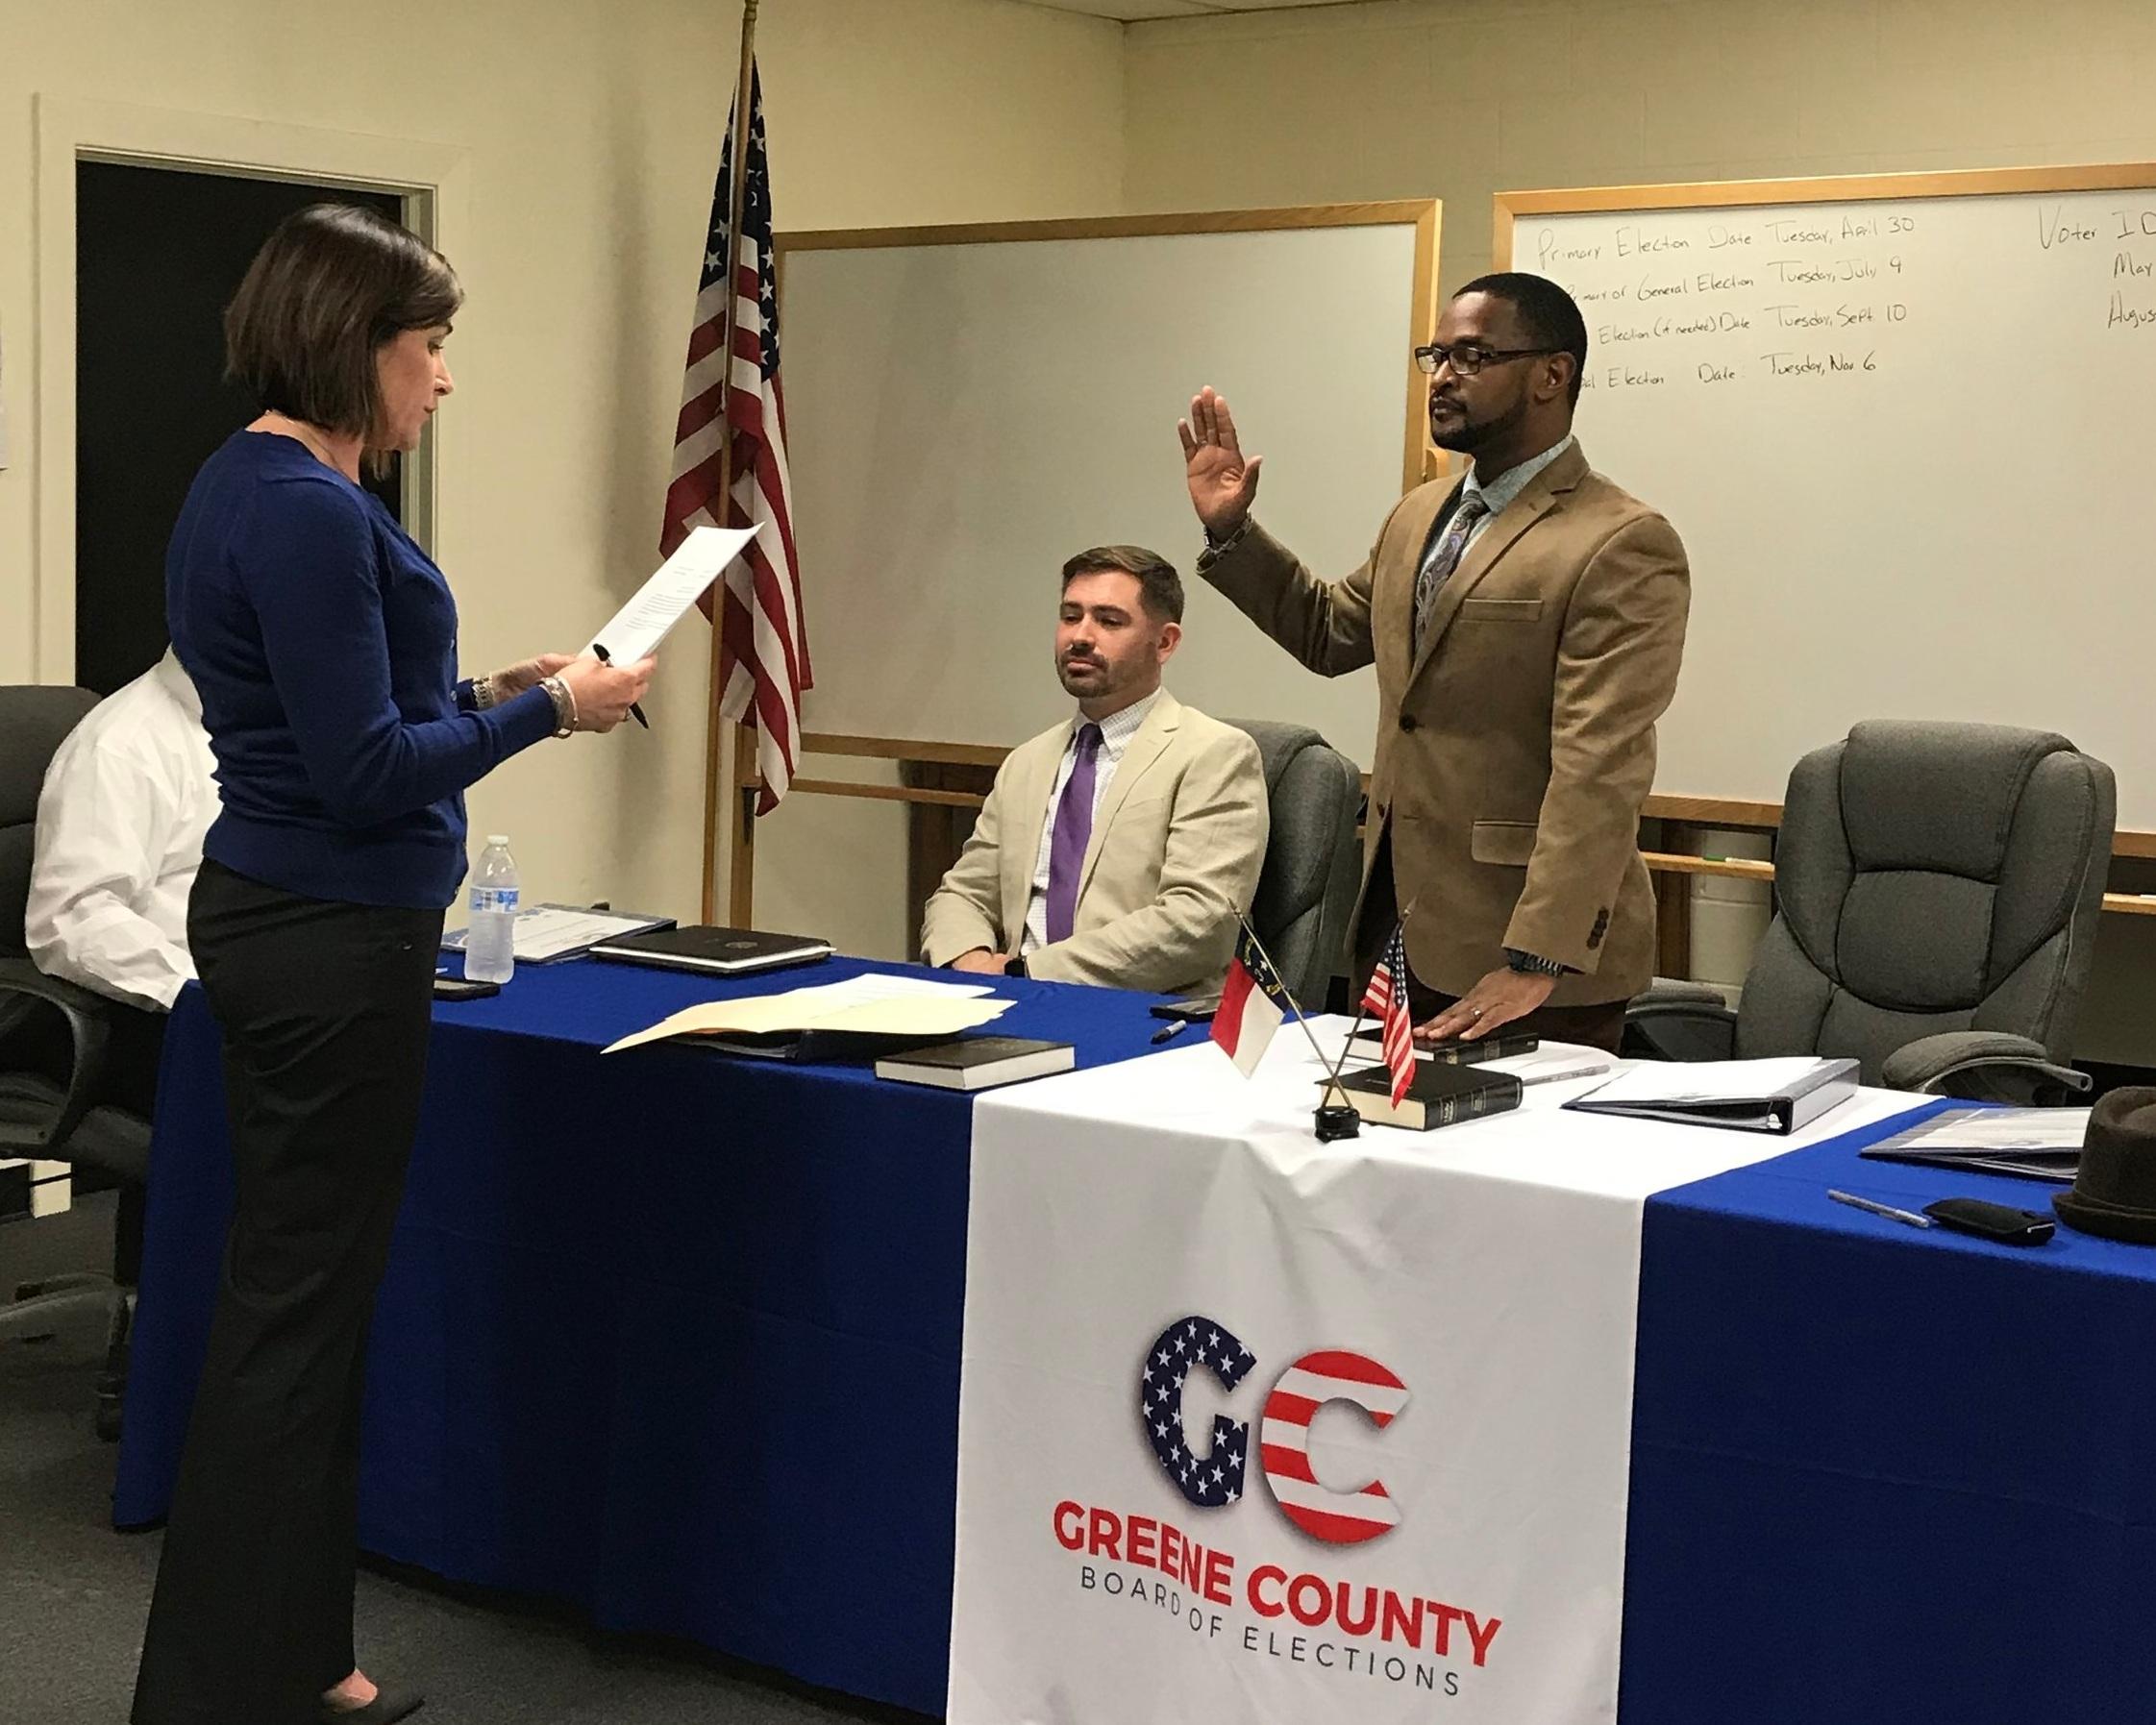 New Greene County Board of Elections Chairman Louis Joyner. Photo by Kristy Bock / Neuse News